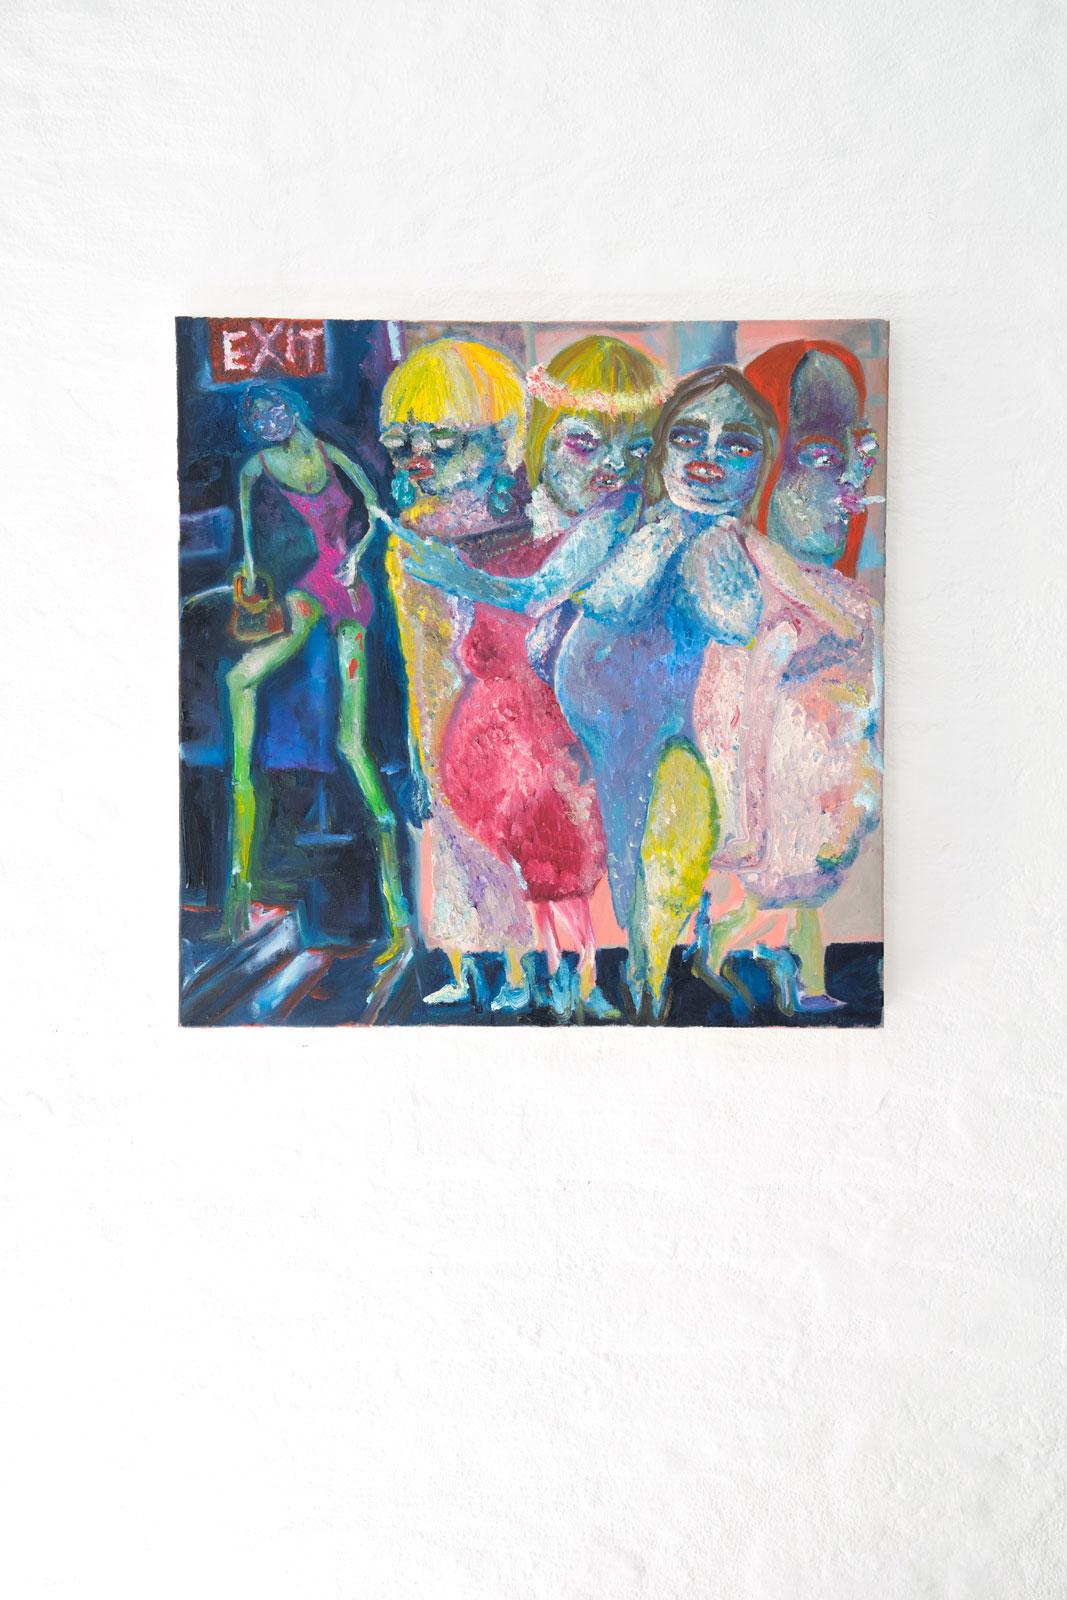 Joseph Geagan, Les Demoiselles von Kaiserschmarrn, 2018, Oil on canvas, 70 x 70 cm